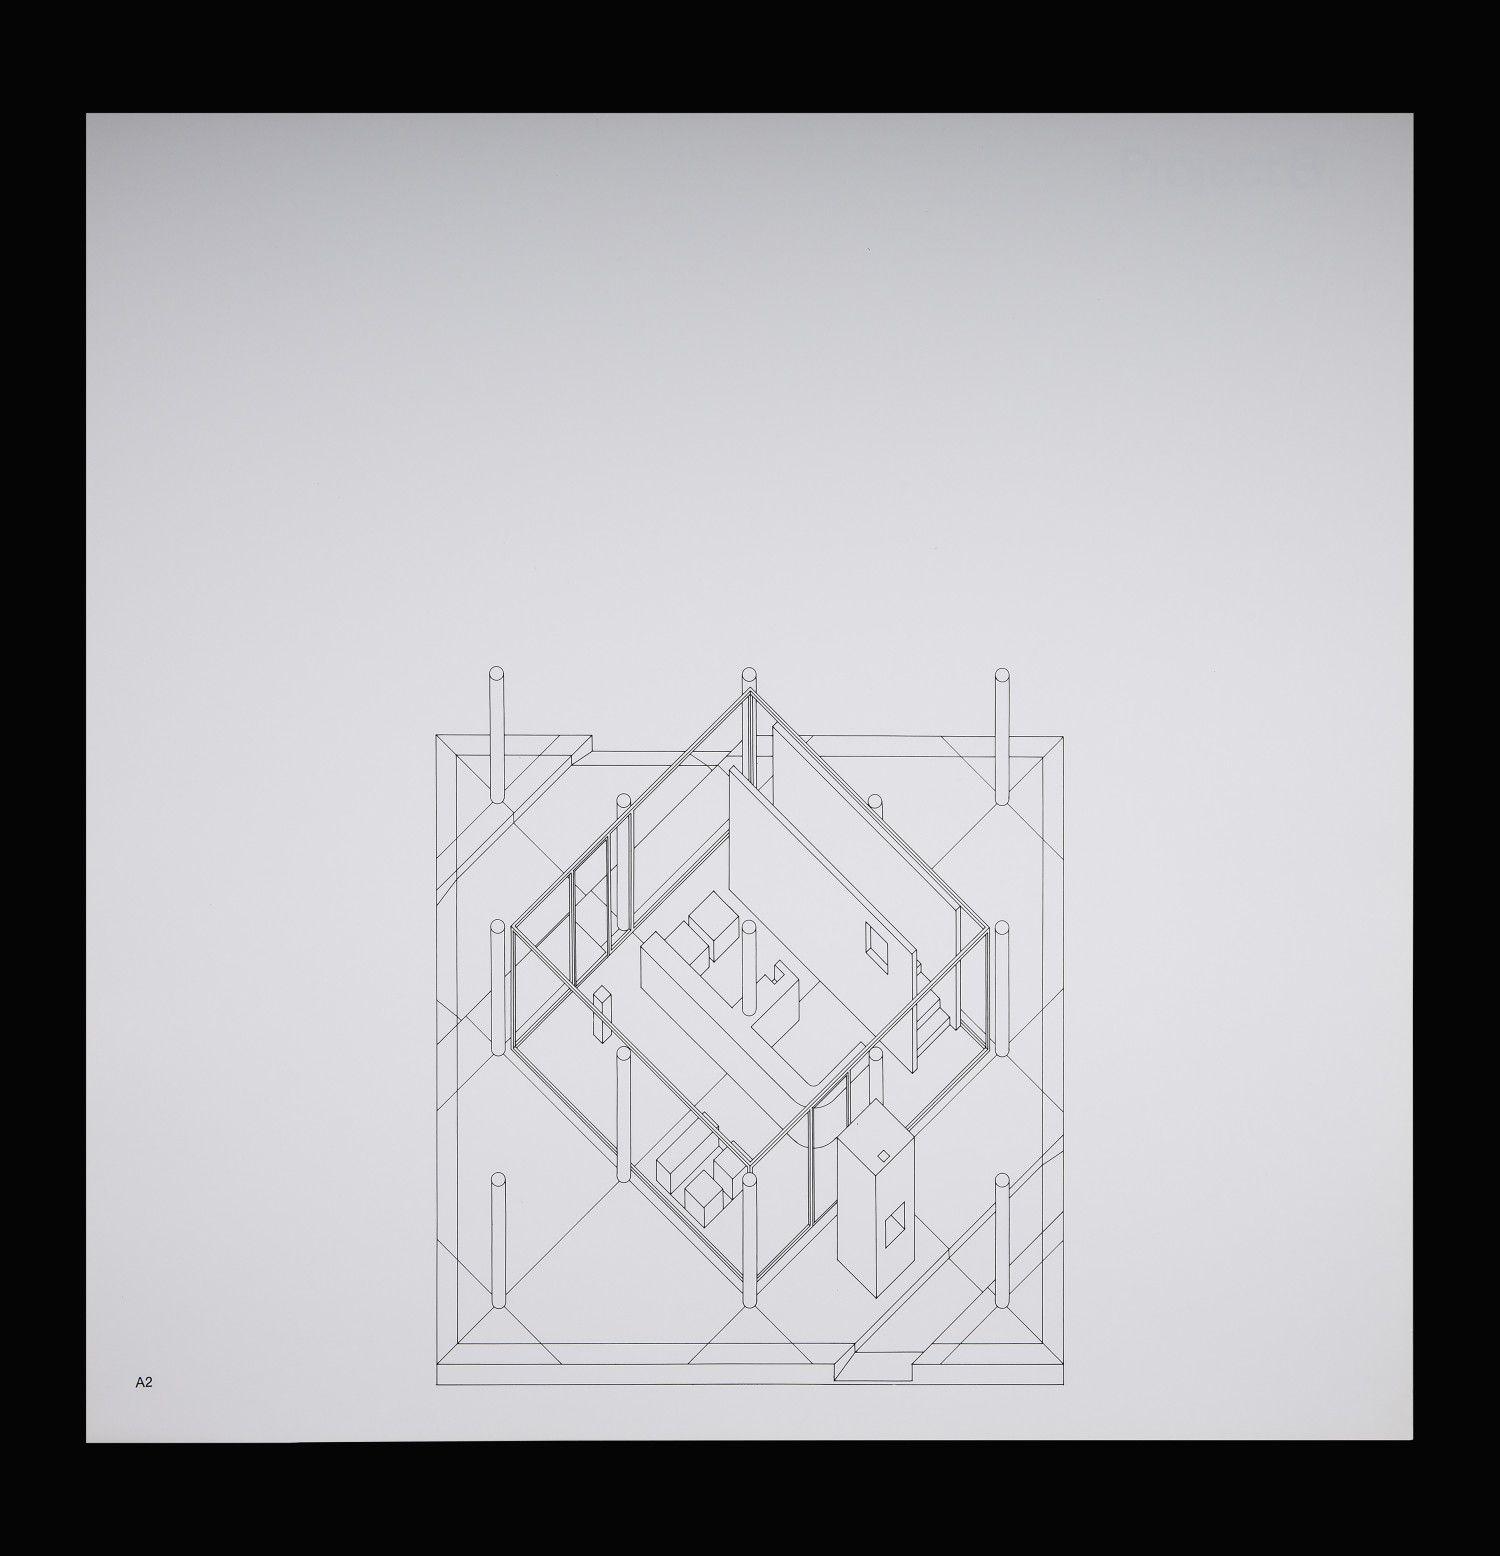 John Hejduk: From Three Projects, 1969 | Drawing Matter